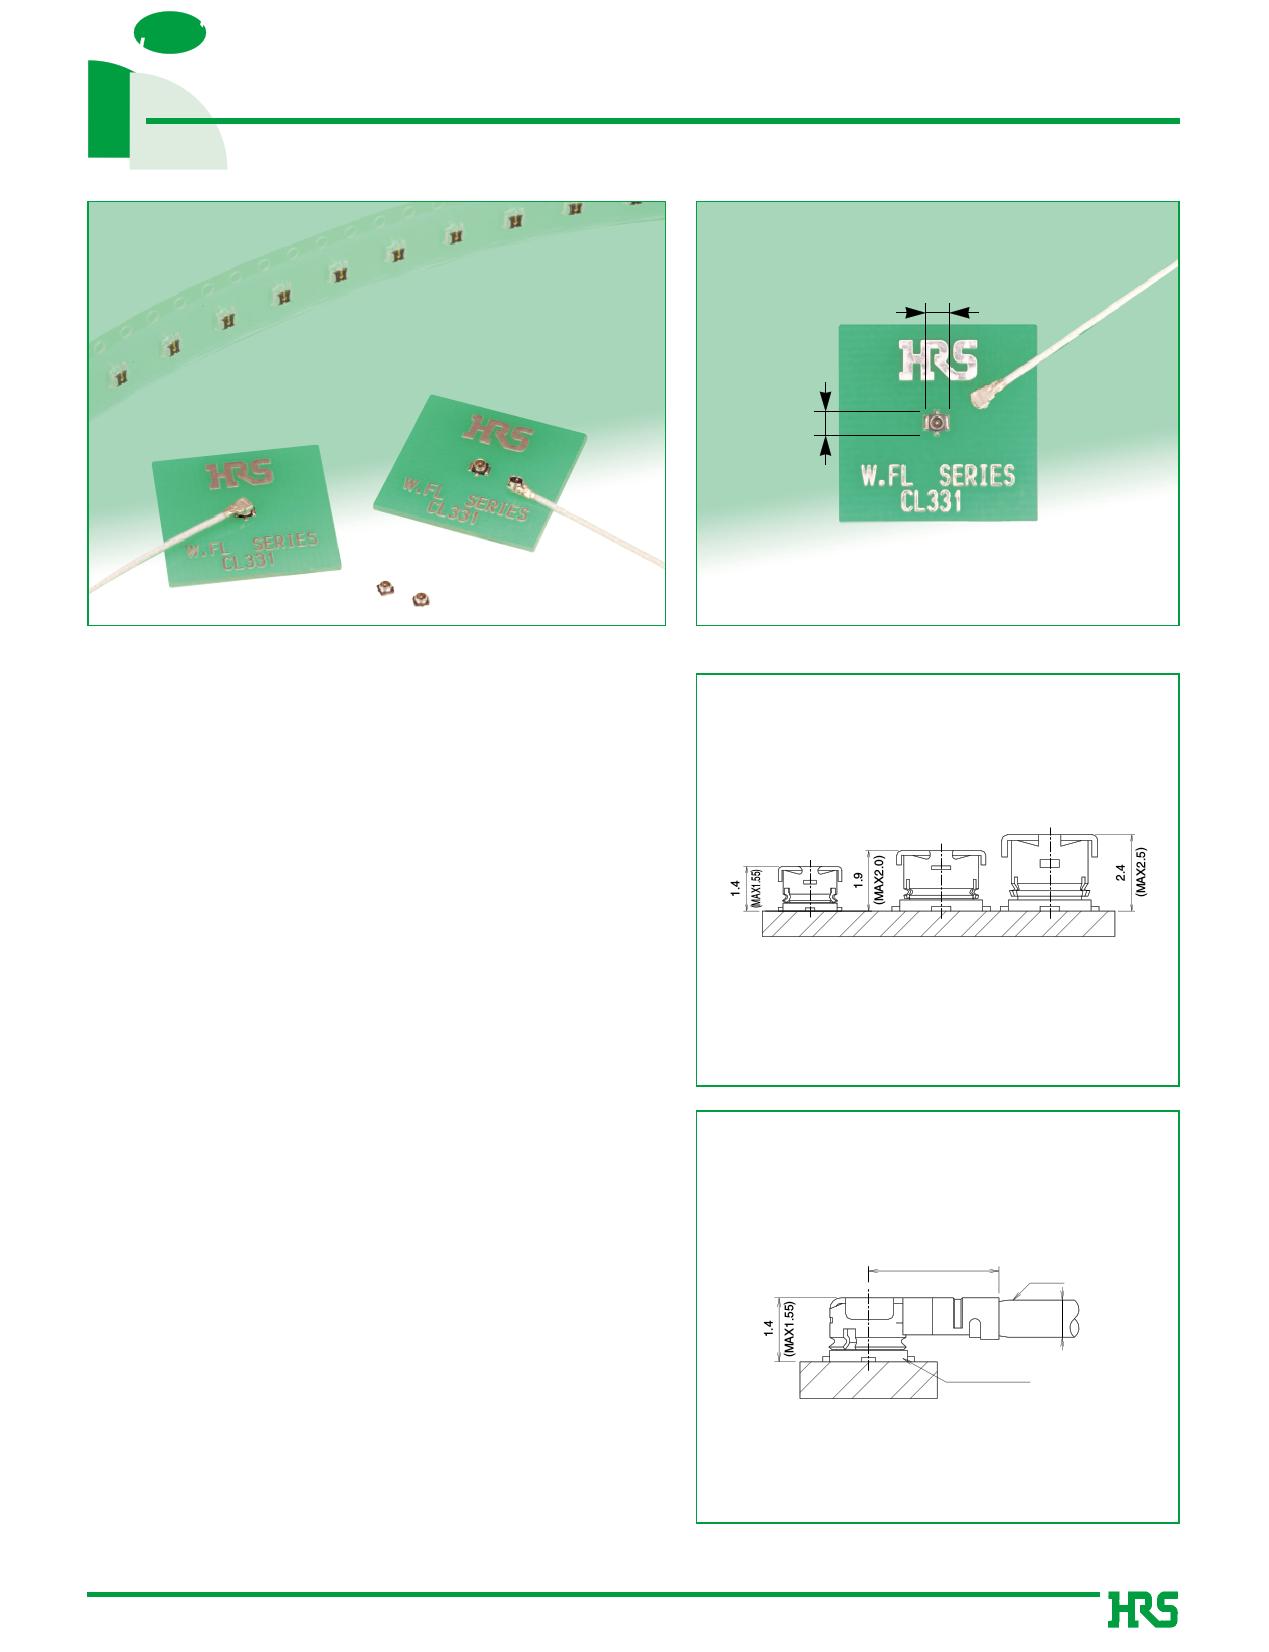 W.FL-2LP-04N2-A-L datasheet